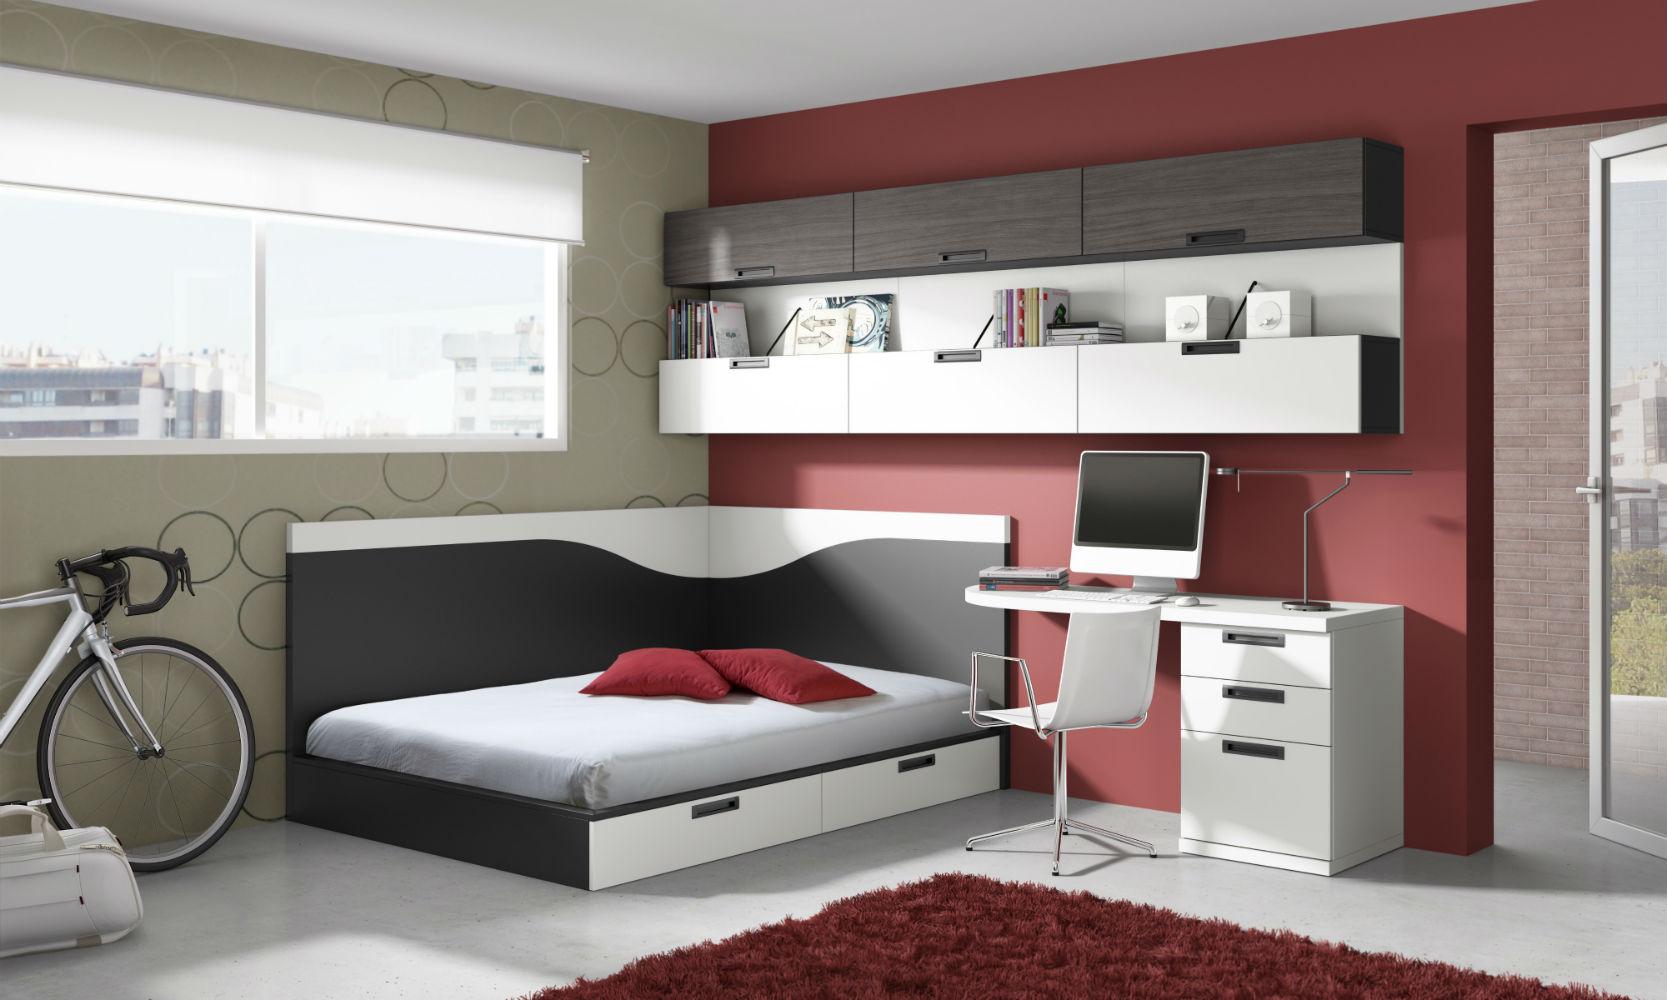 Dormitorio juvenil infantil moderno 1194 101 muebles valencia for Muebles juveniles modernos